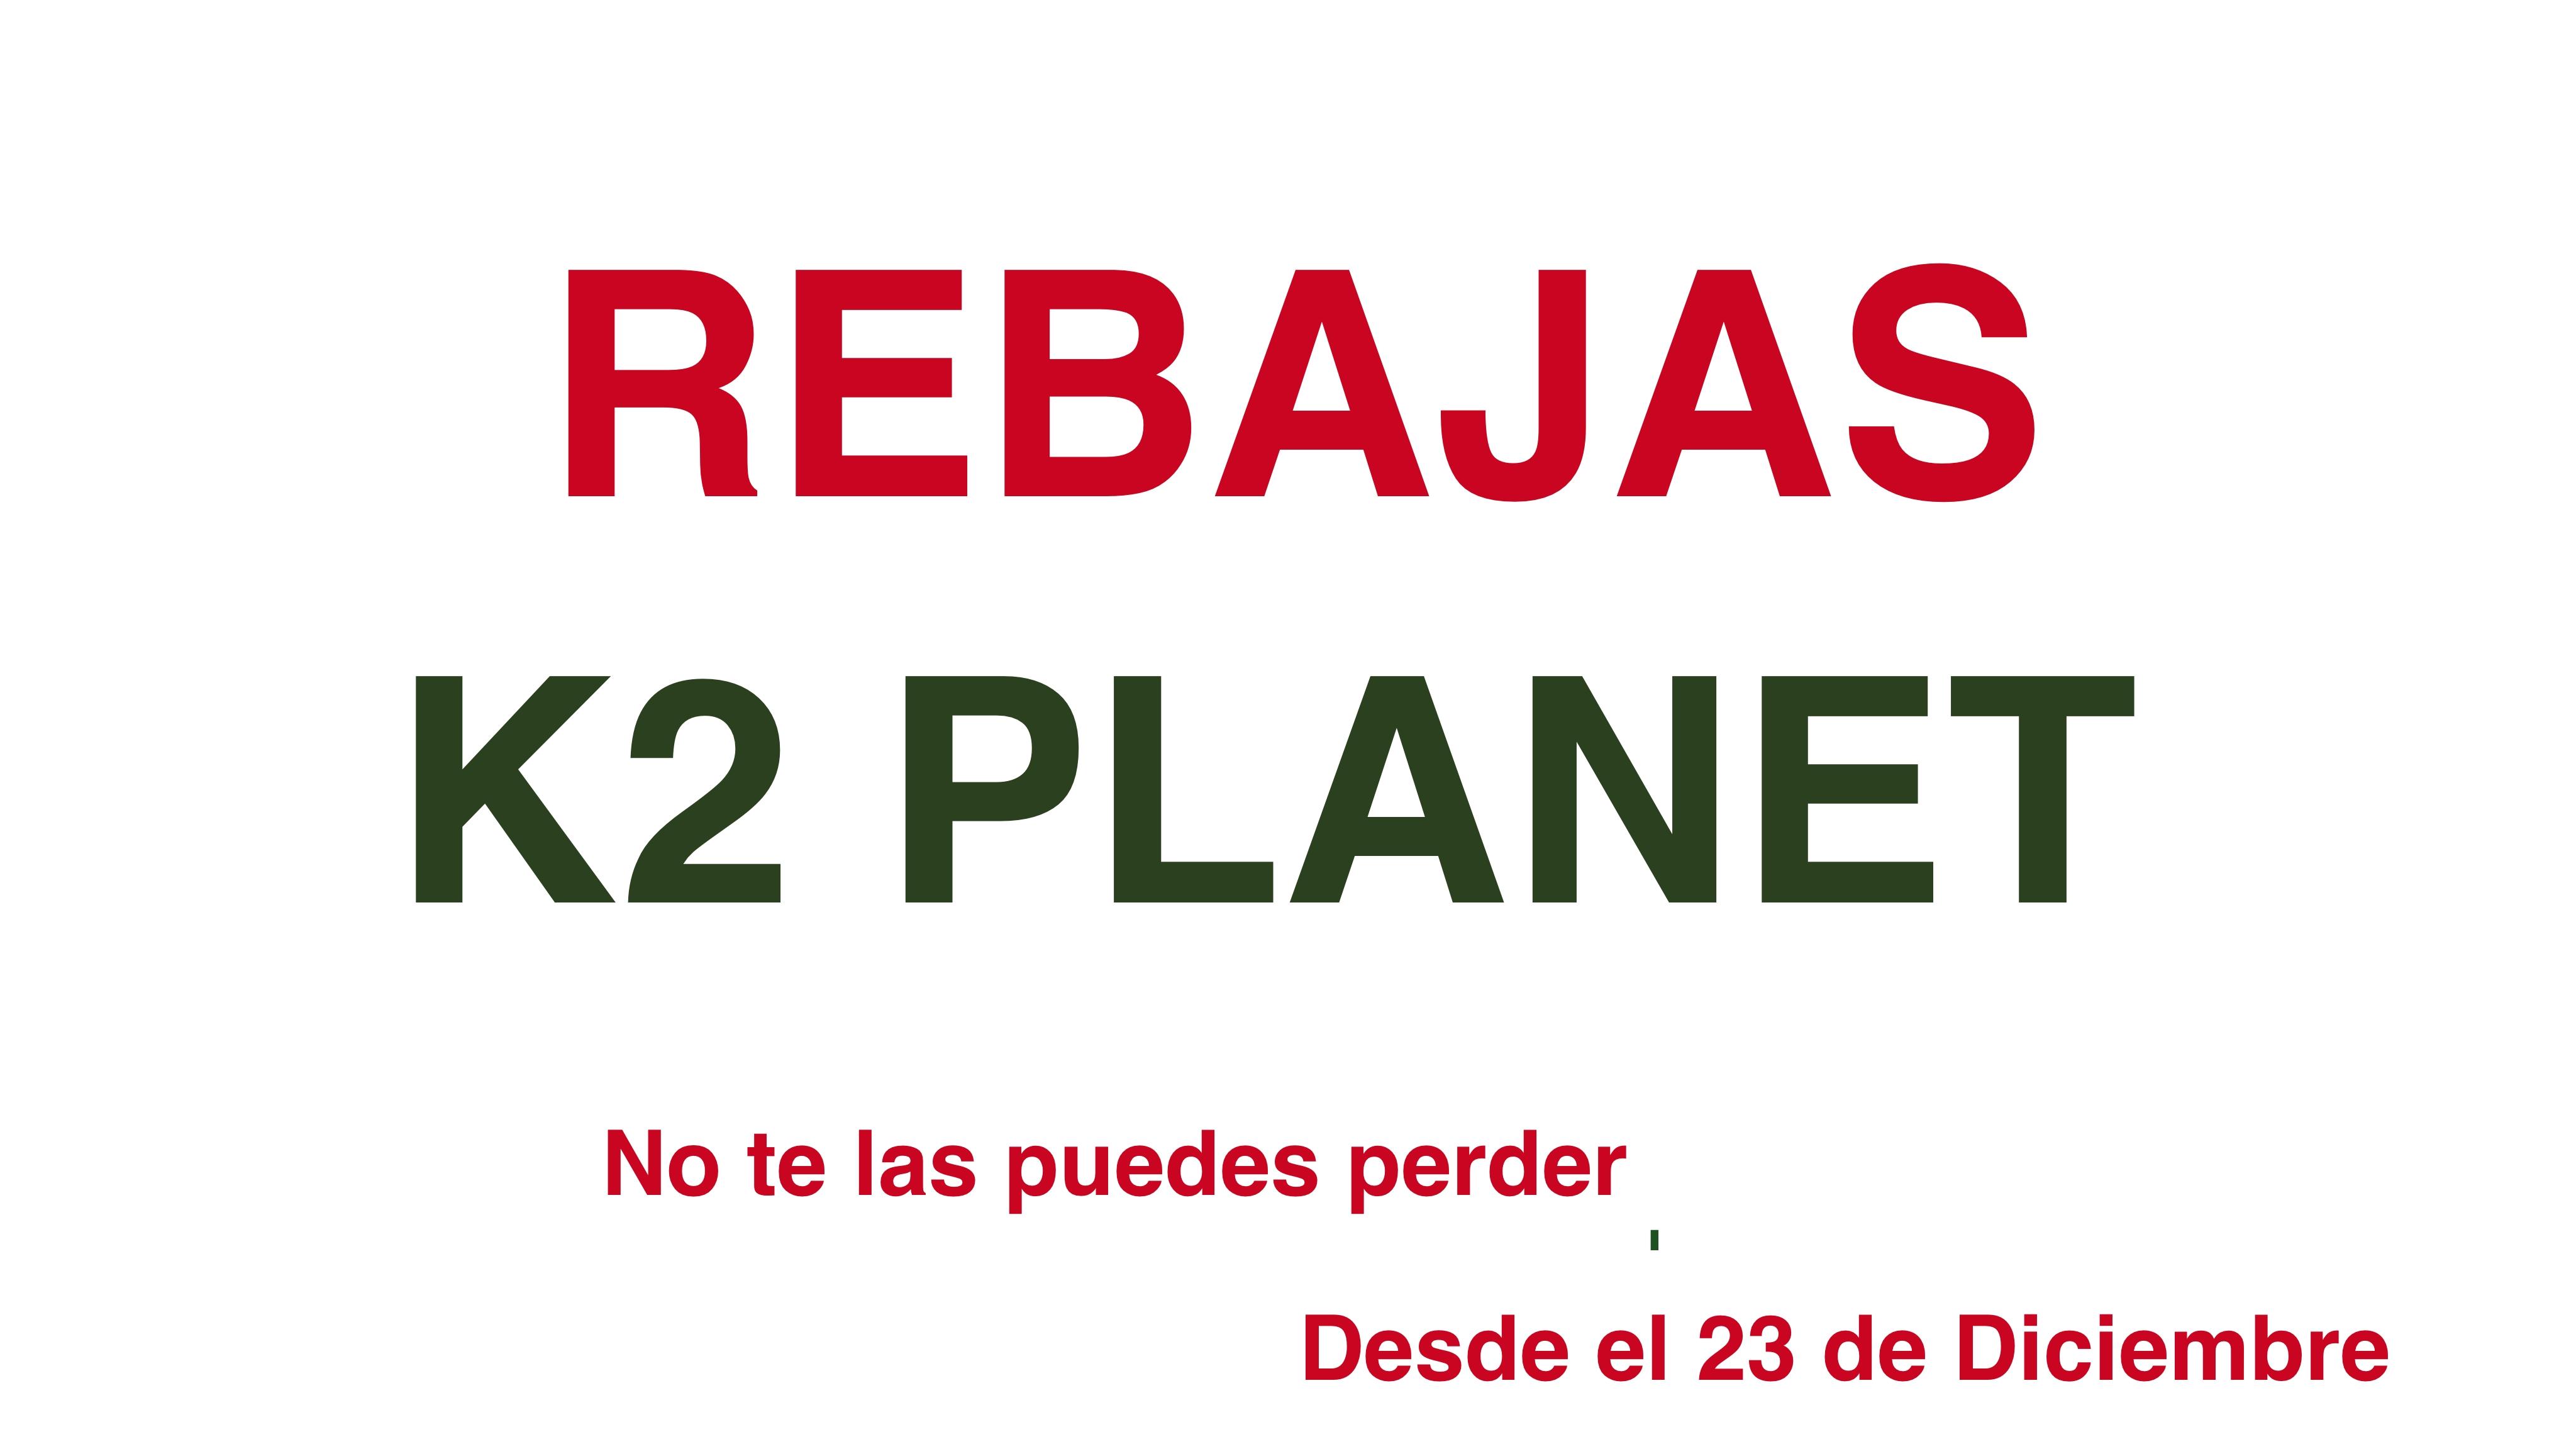 REBAJAS K2 PLANET